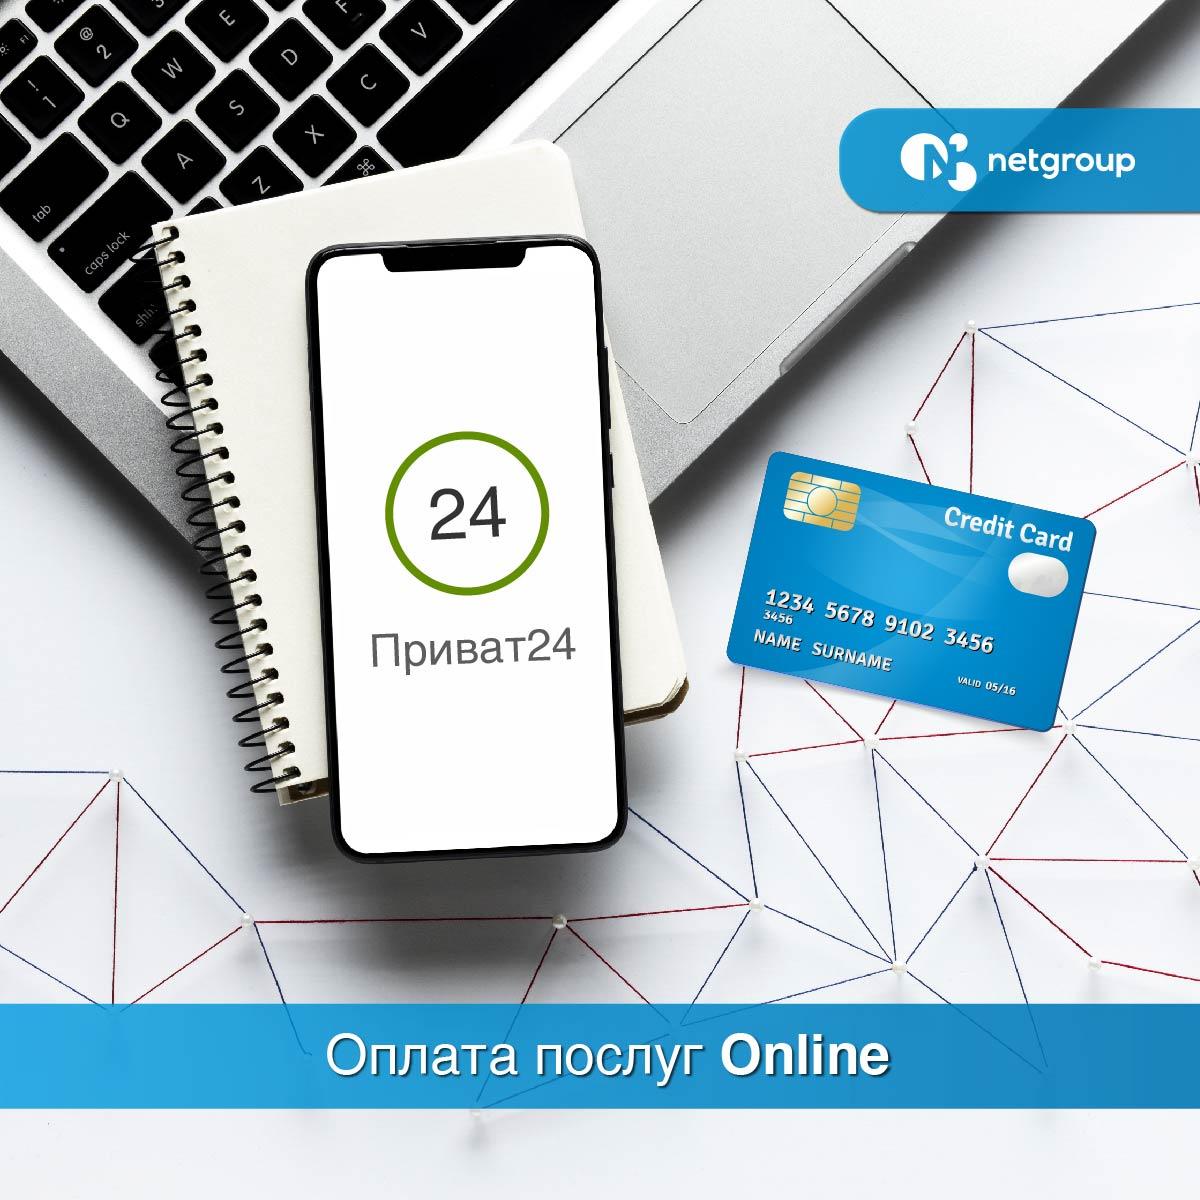 оплата online | netgroup